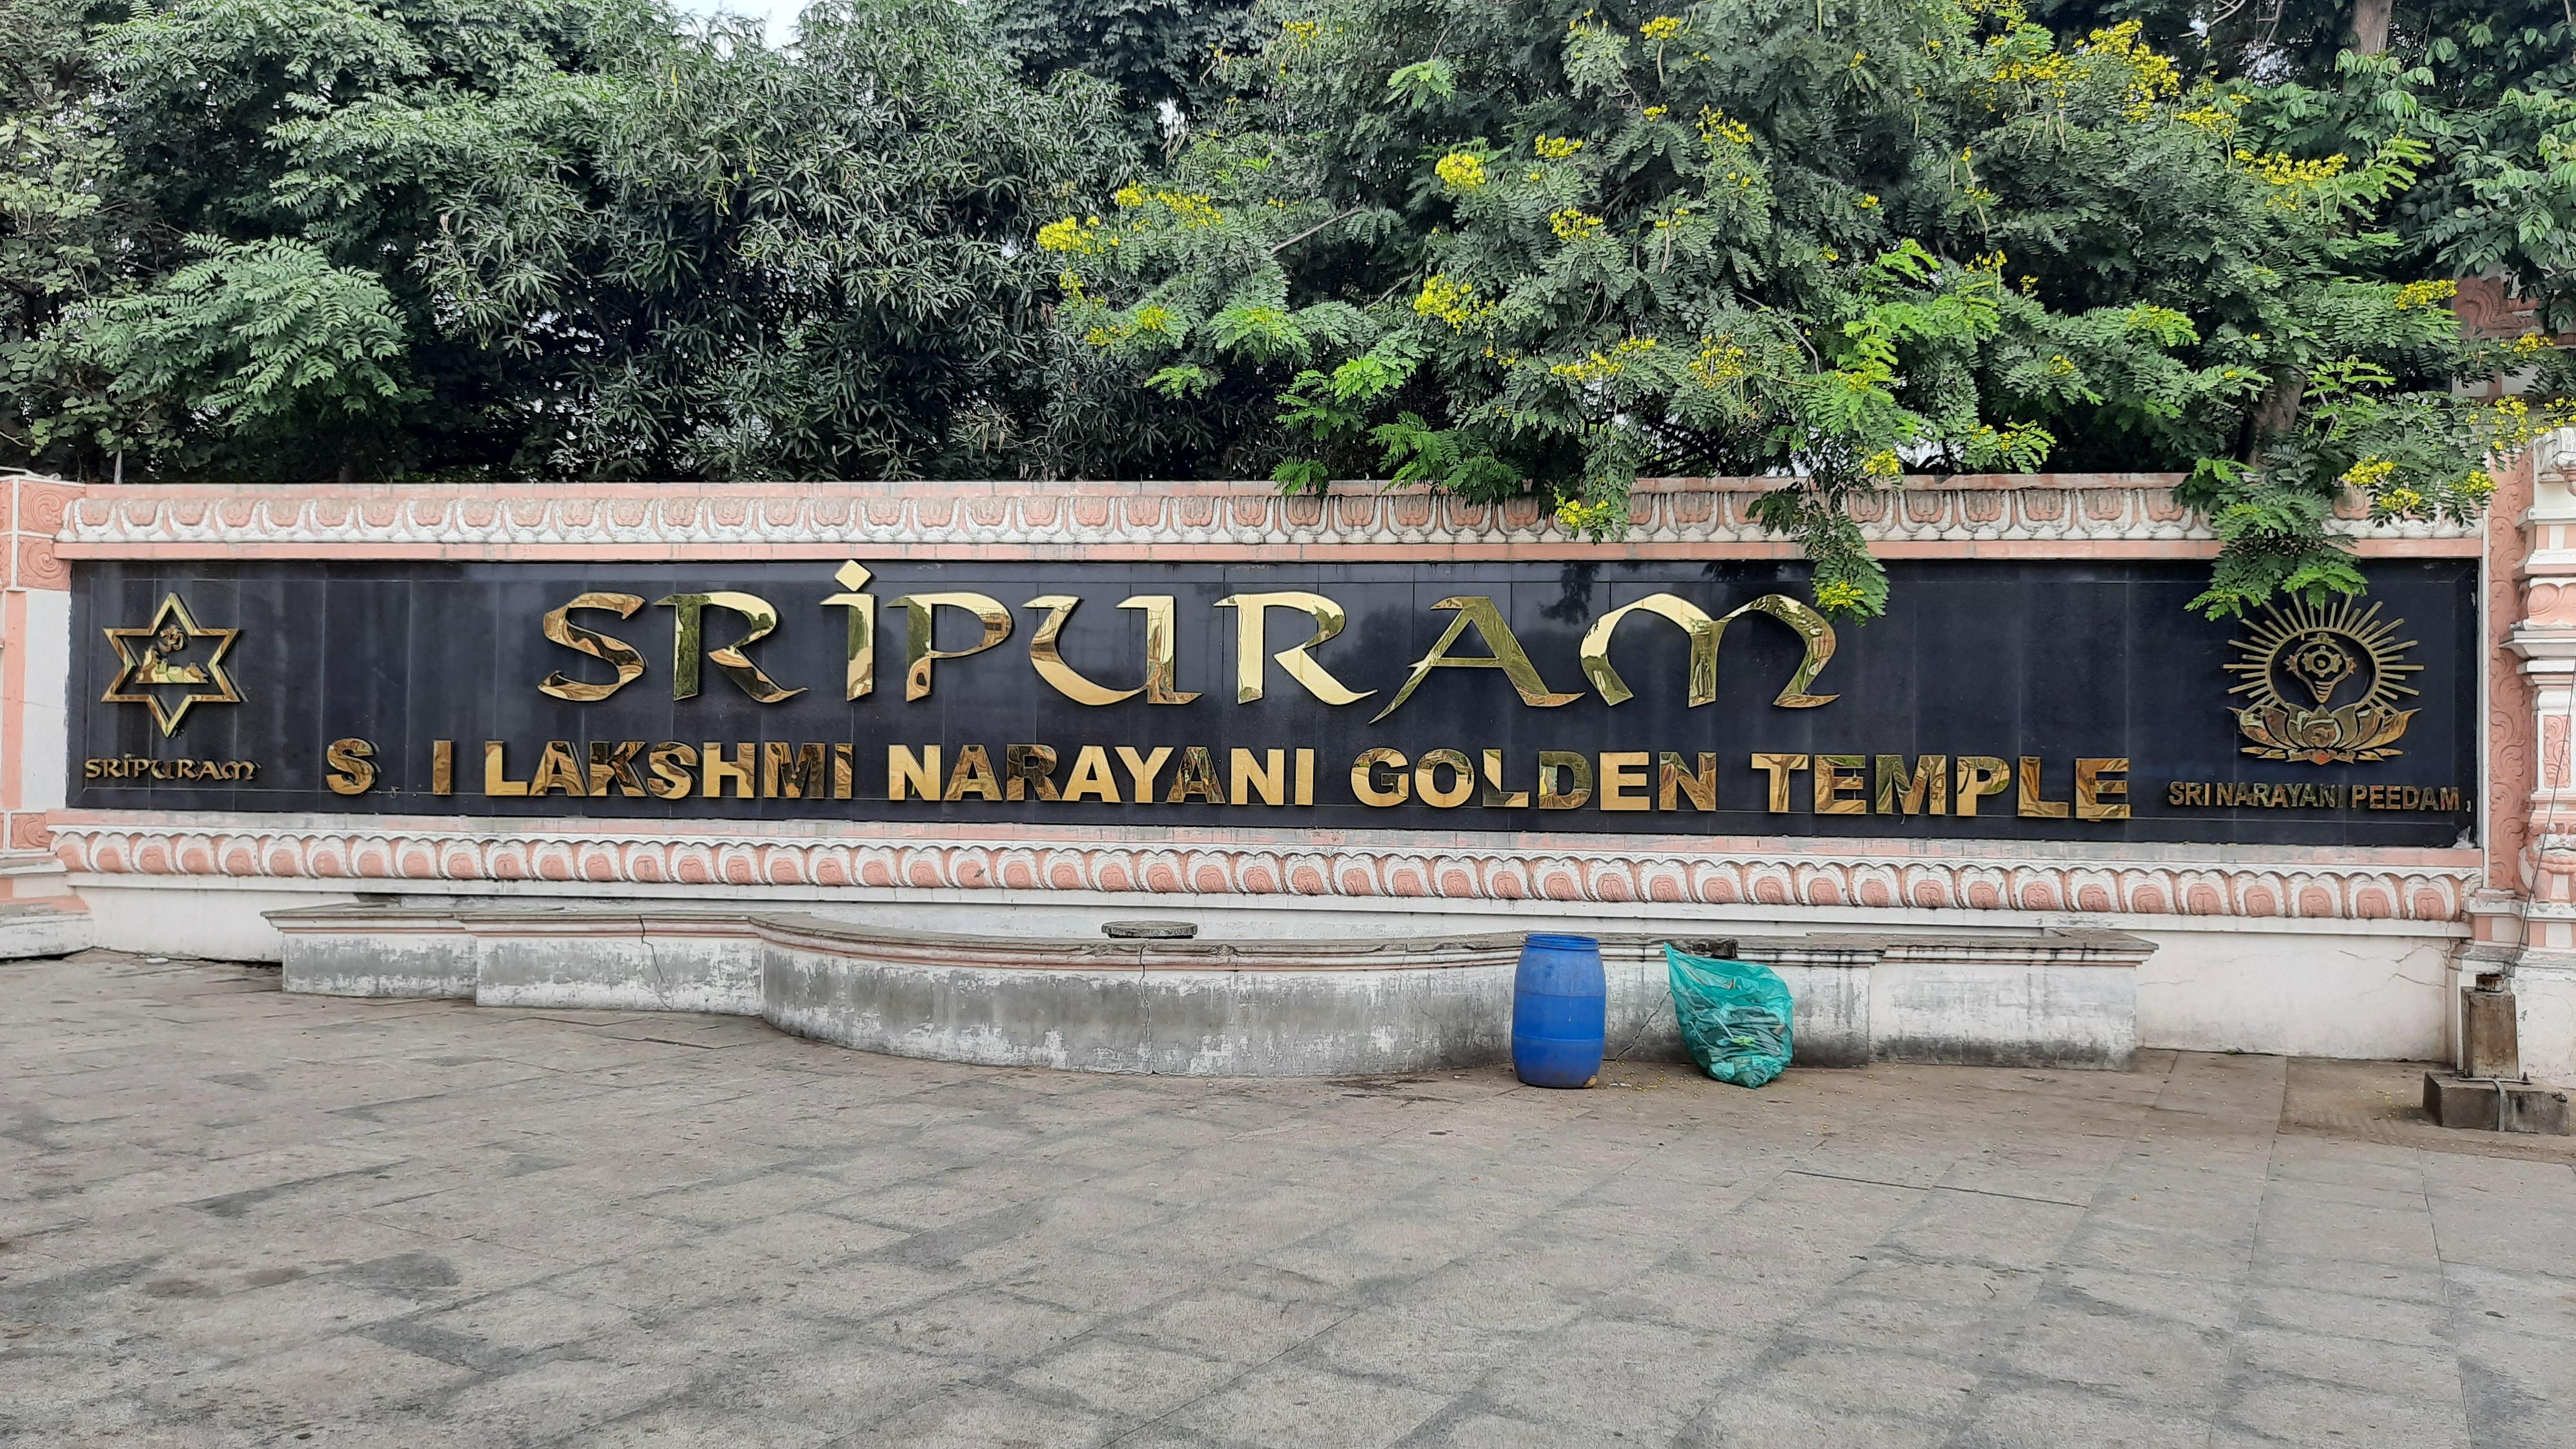 sripuram-golden-temple-tamilnadu-india